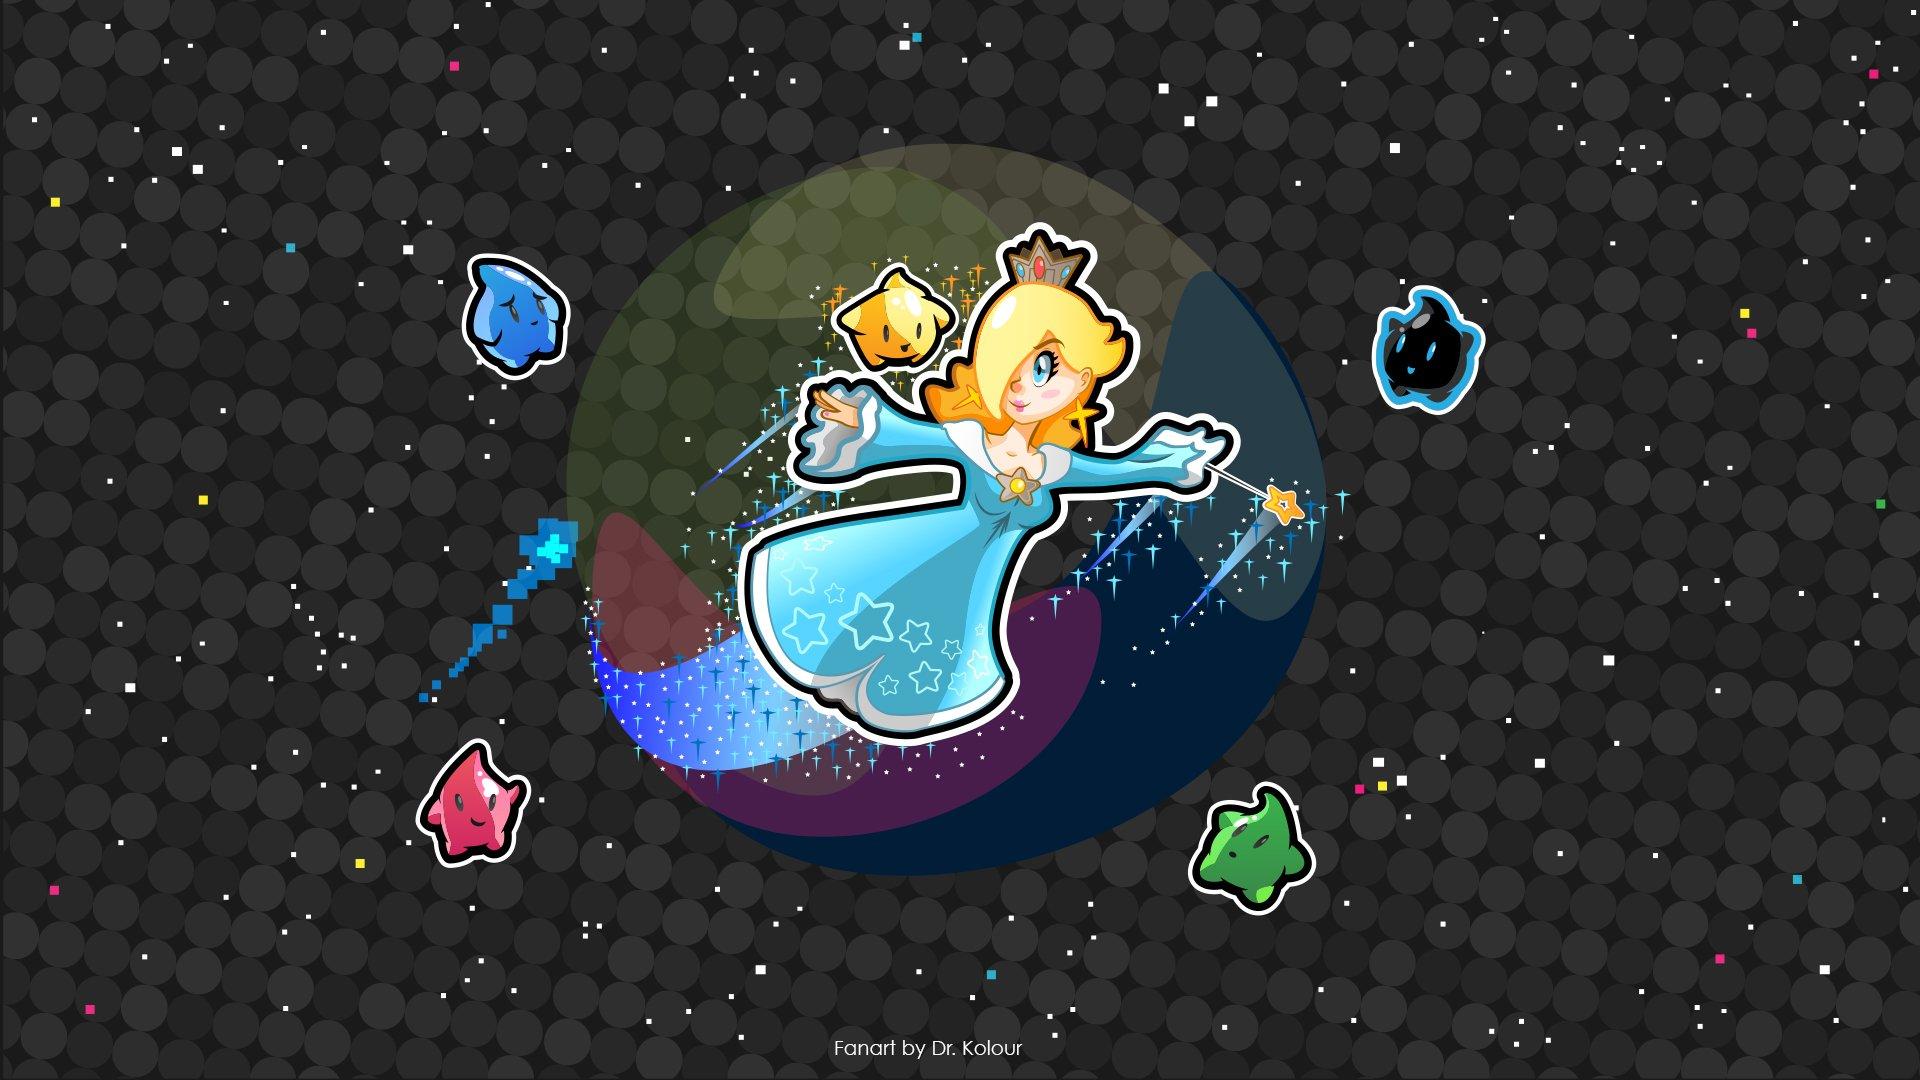 Videojuego - Super Mario Galaxy  Rosalina (Mario) Fondo de Pantalla